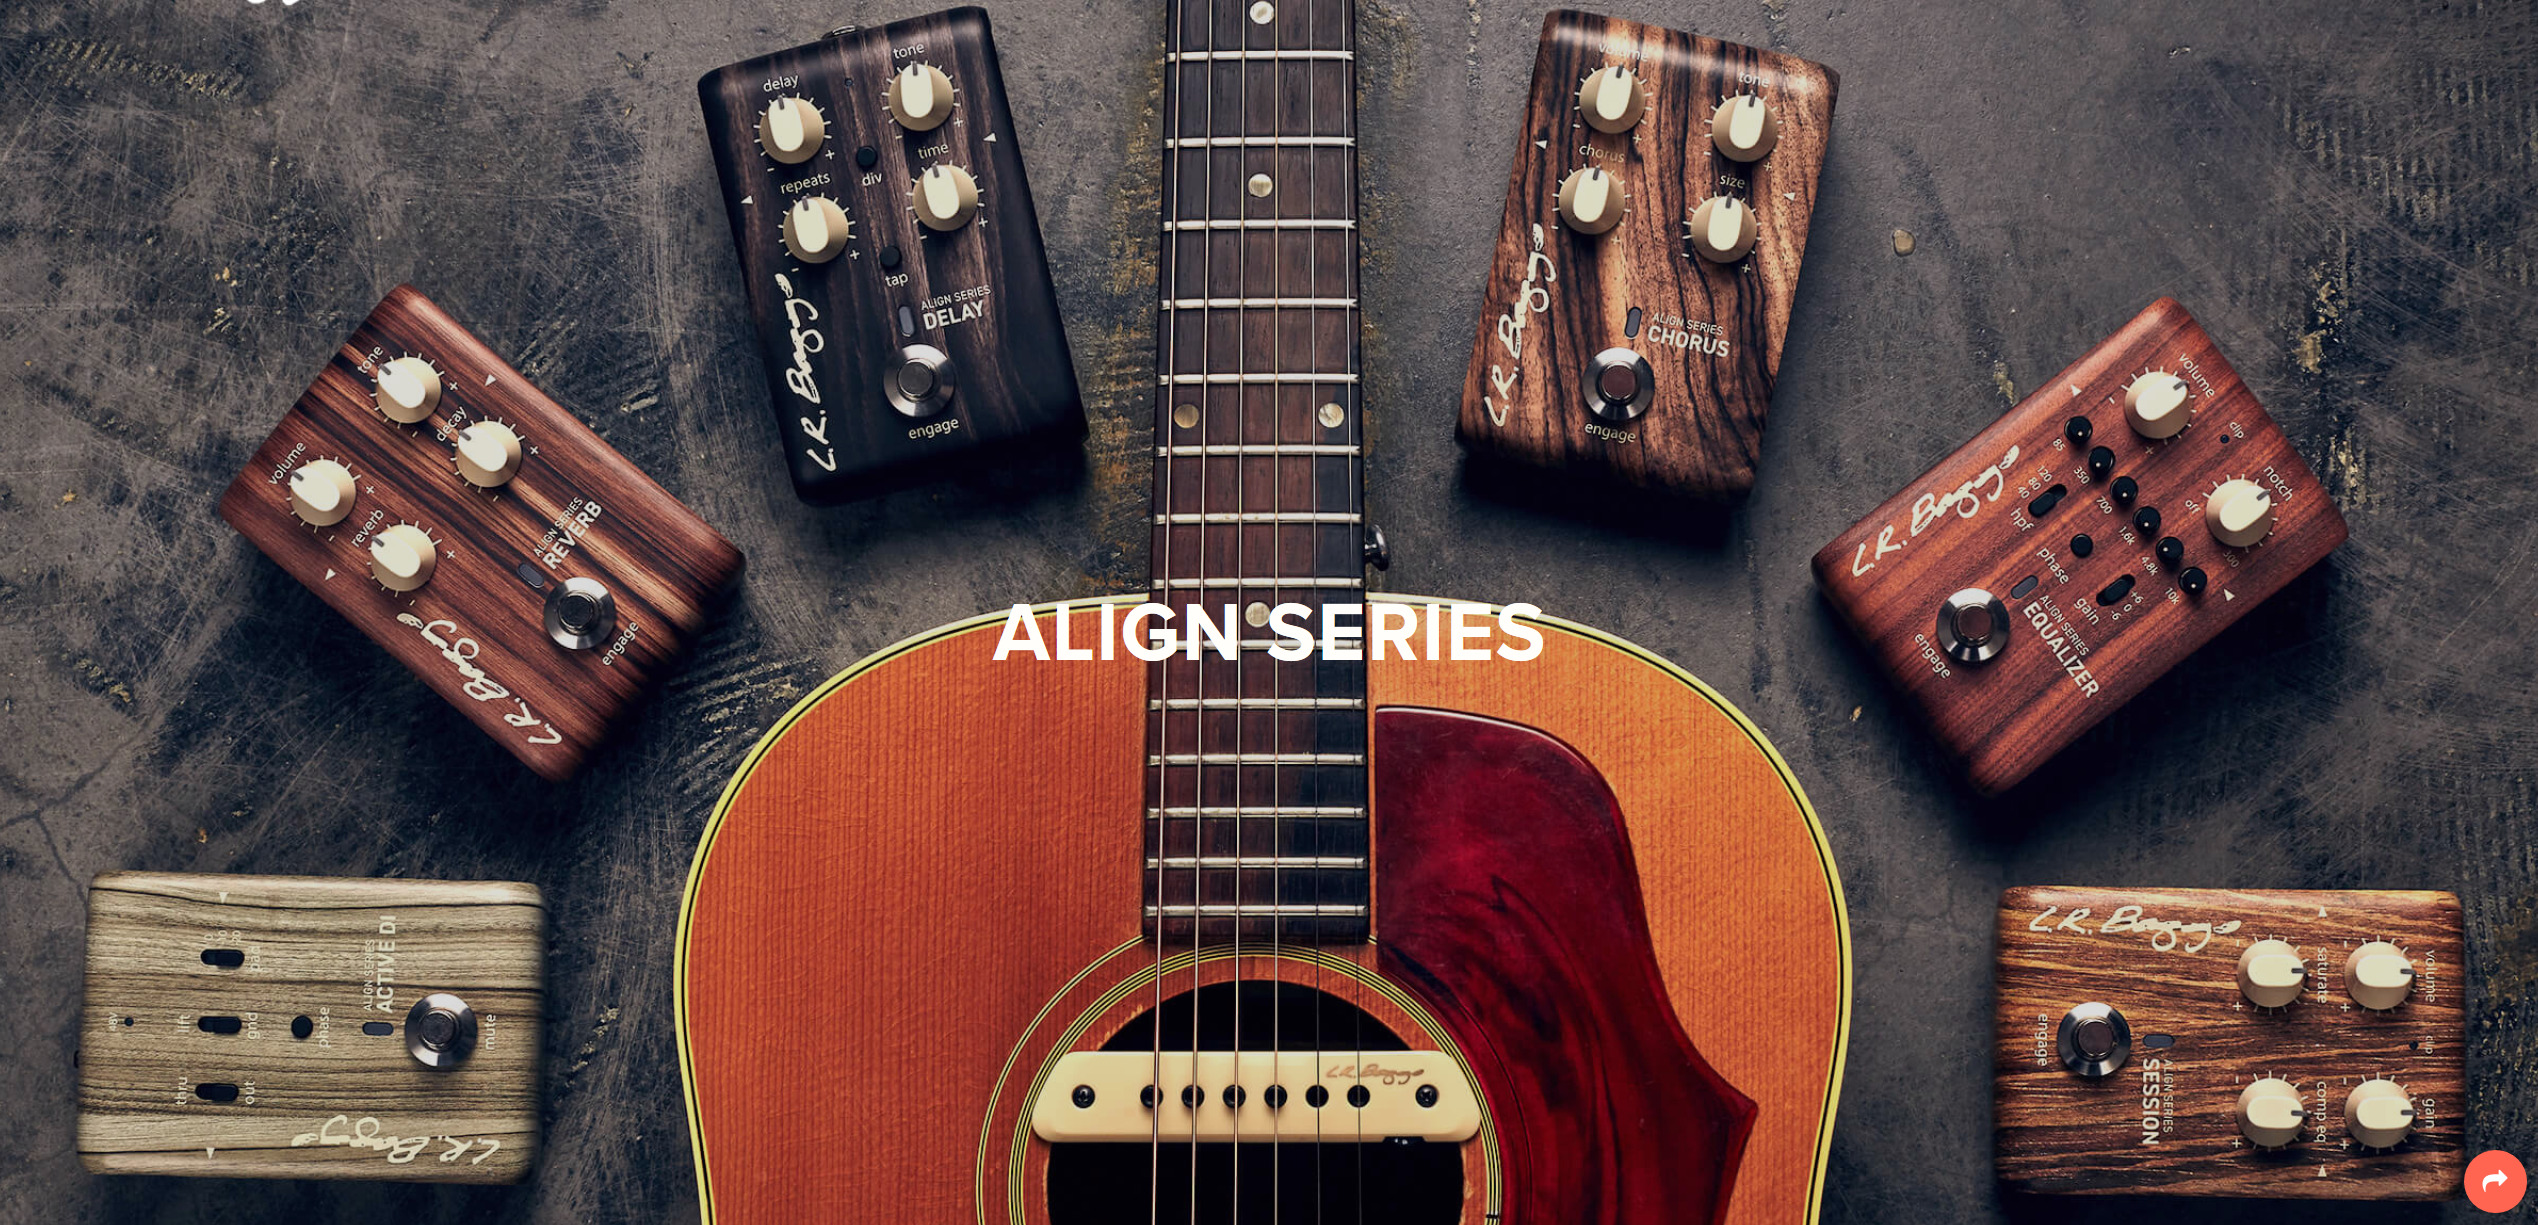 screenshot-2019-02-07-align-series-acoustic-pedal-suite-lr-baggs.jpg